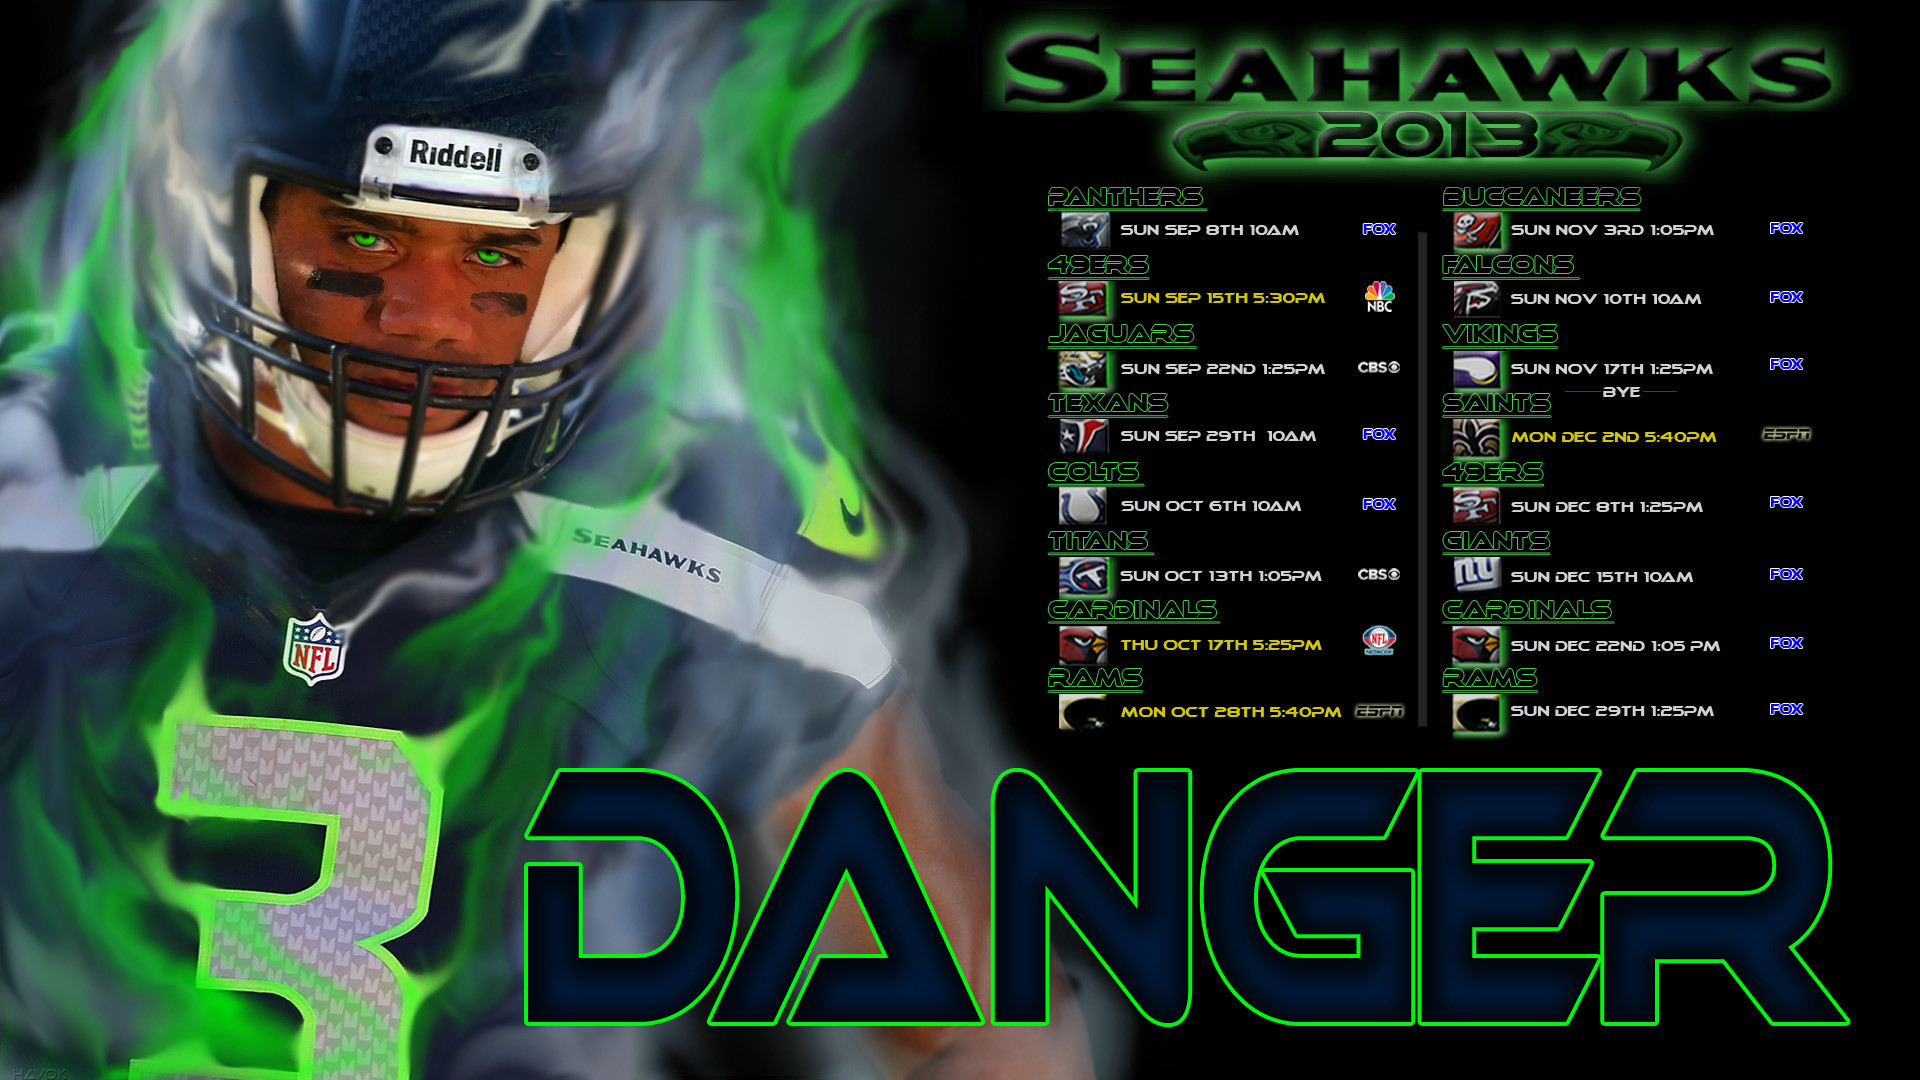 2013 Seatlle Seahawks football nfl hg wallpaper